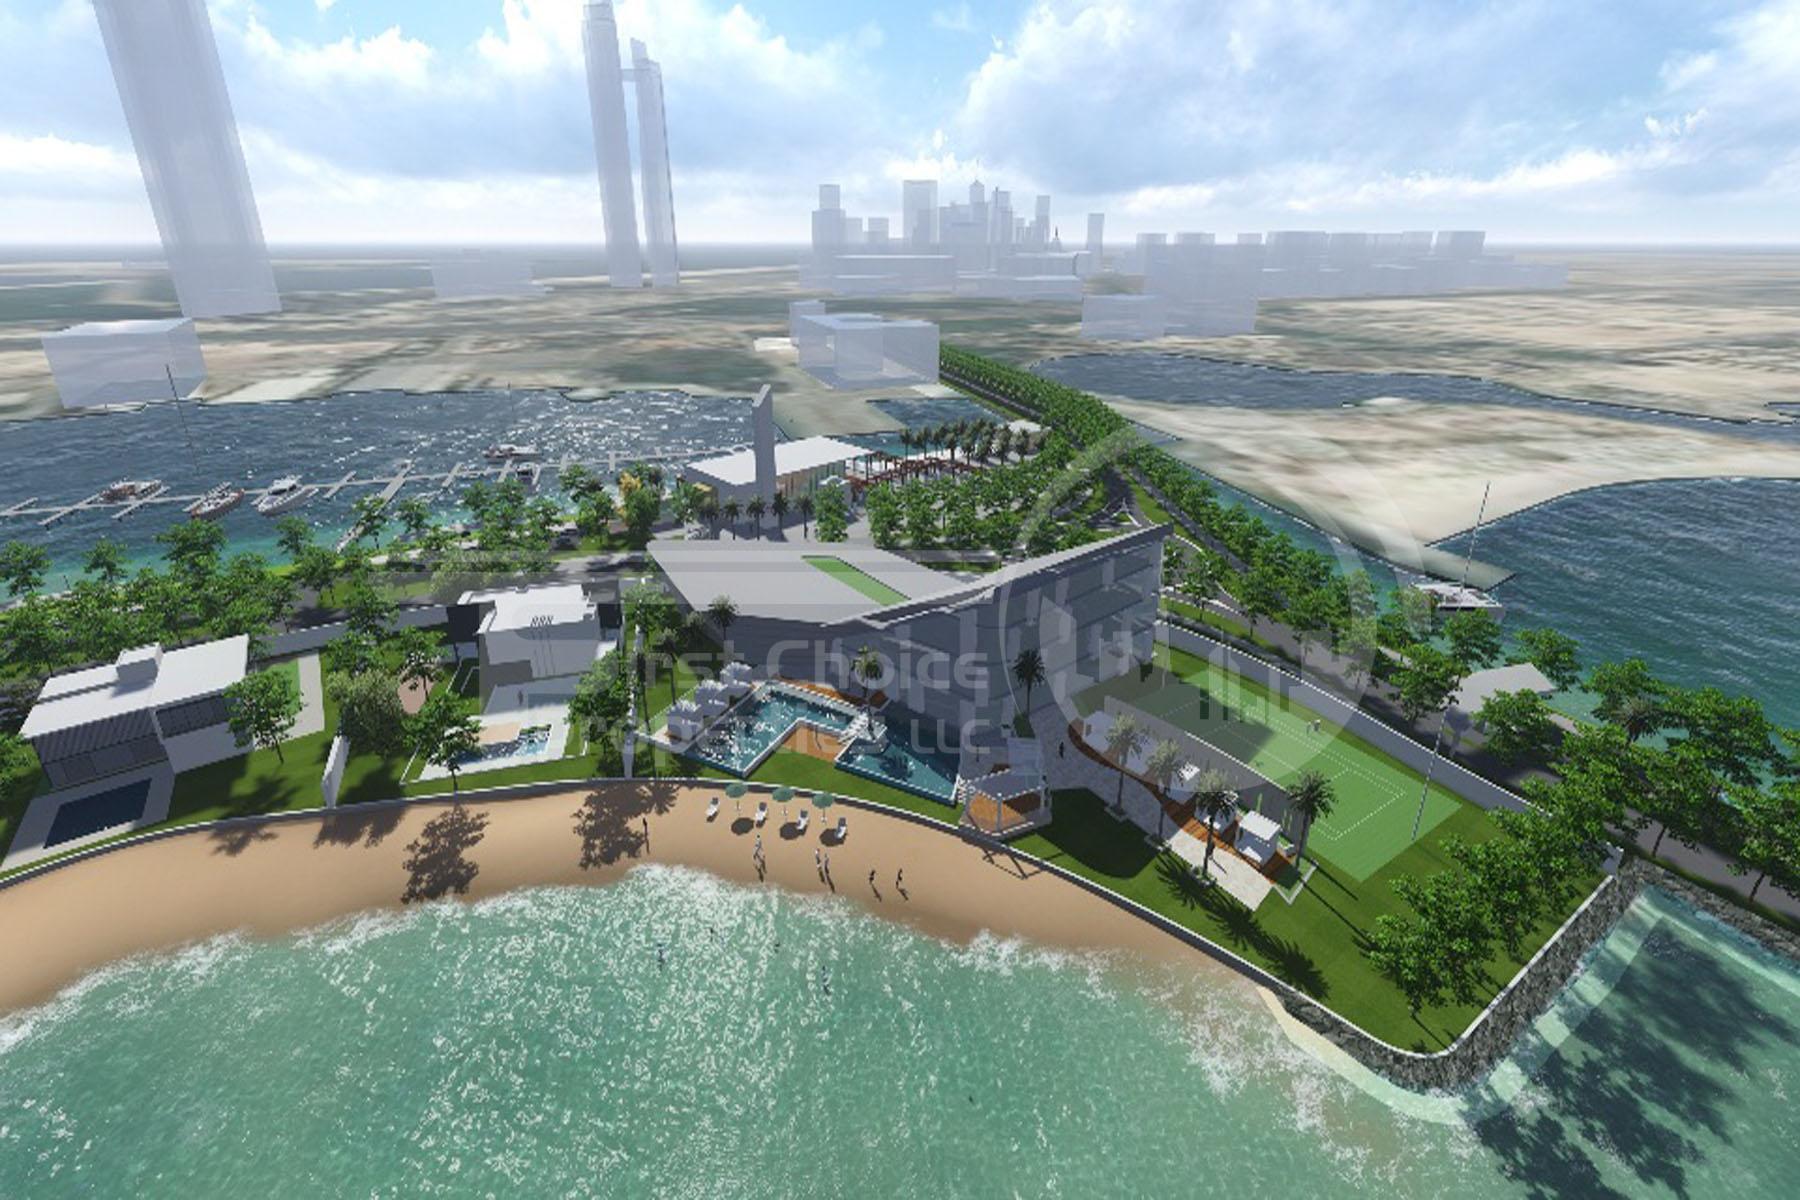 Residential Island - Nareel Island - Al Bateen - Abu Dhabi - UAE (5).jpg